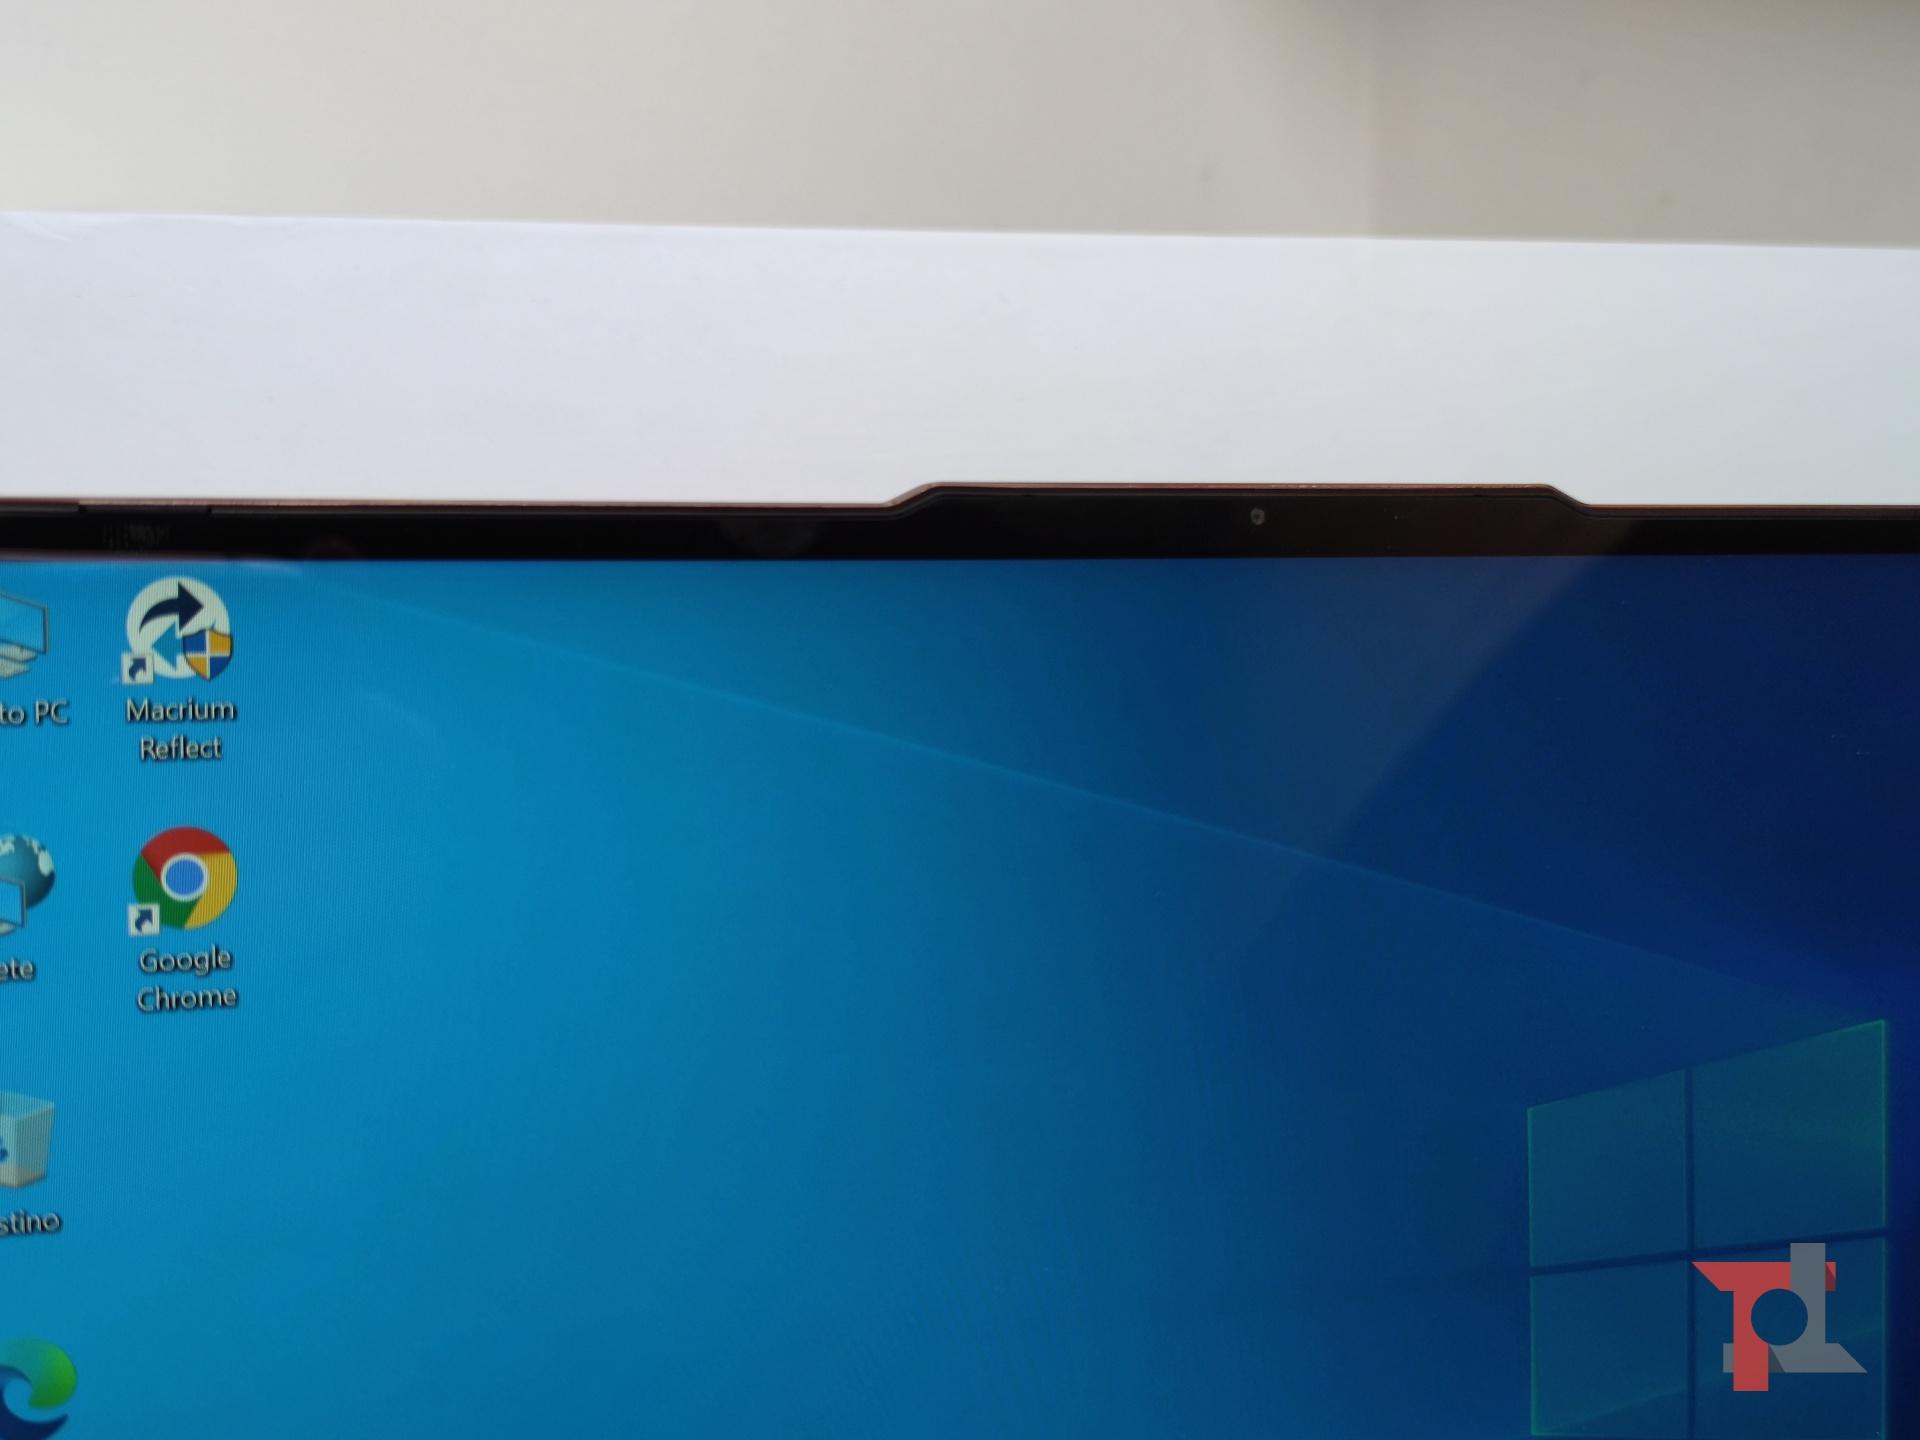 Recensione Jumper EZBook X3 Air, look premium a basso costo 9